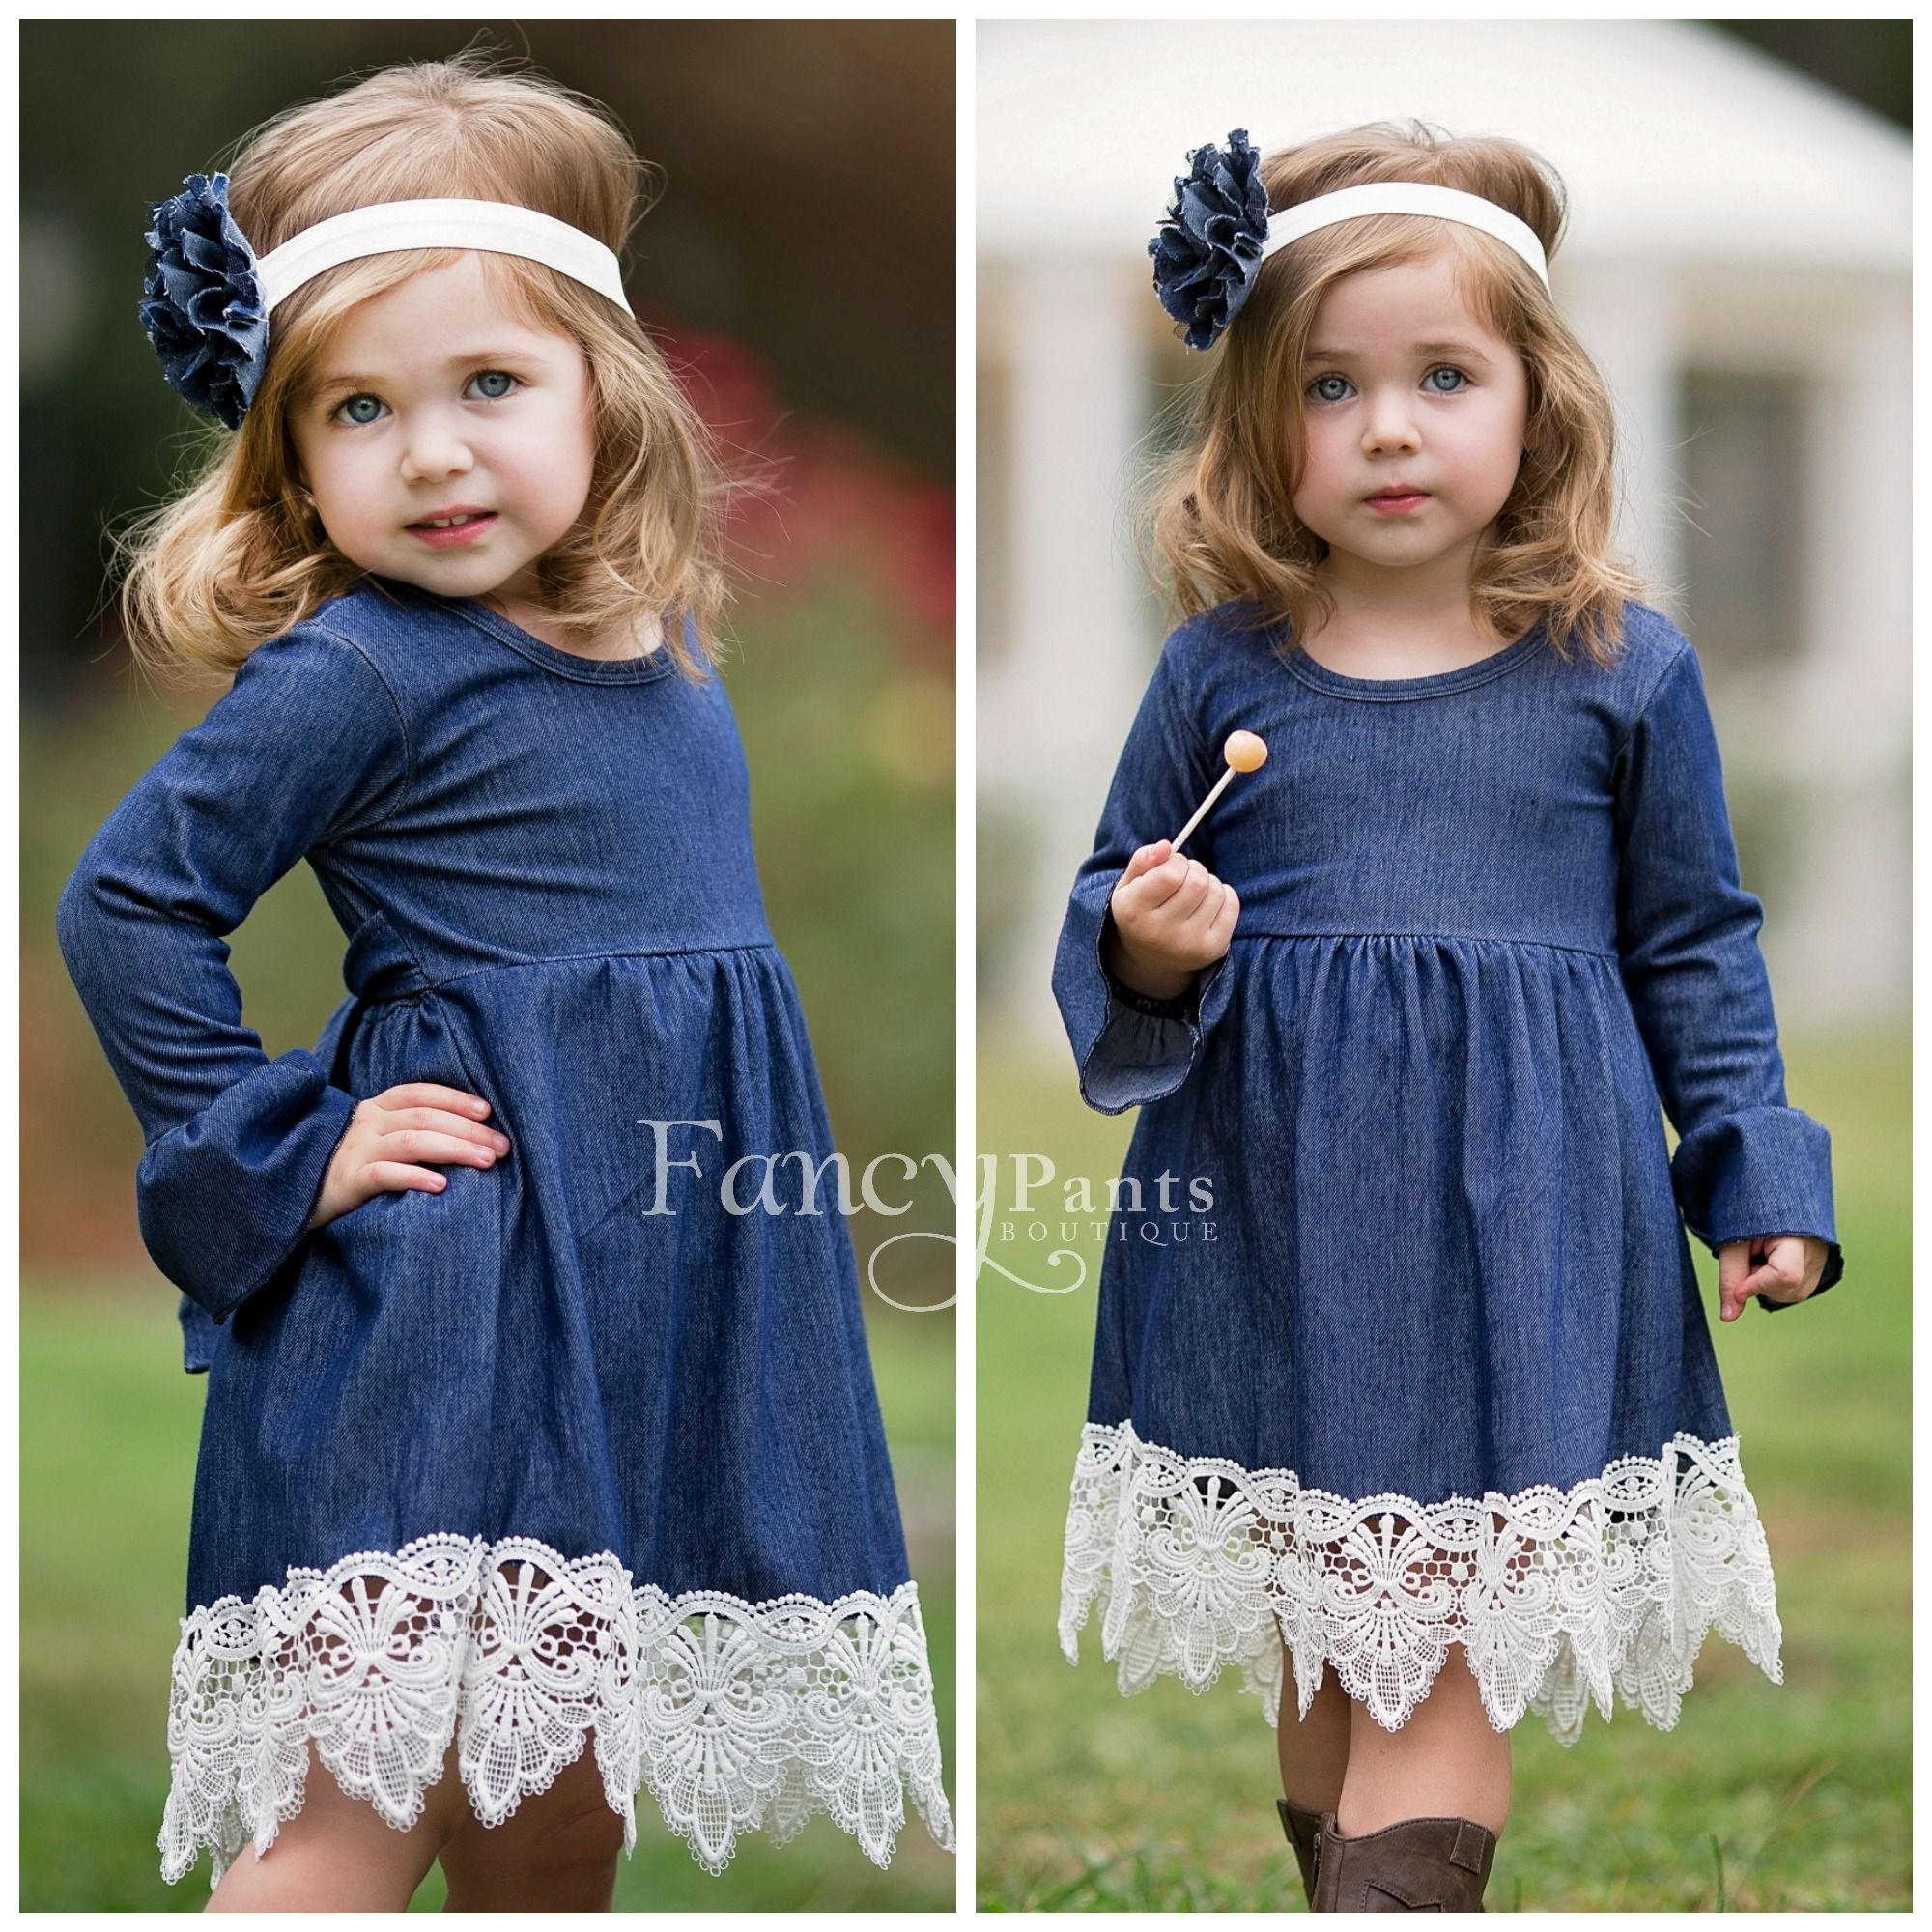 Rustic wedding flower girl dresses  Country Flower girl dress girls denim dress baby denim dress jean